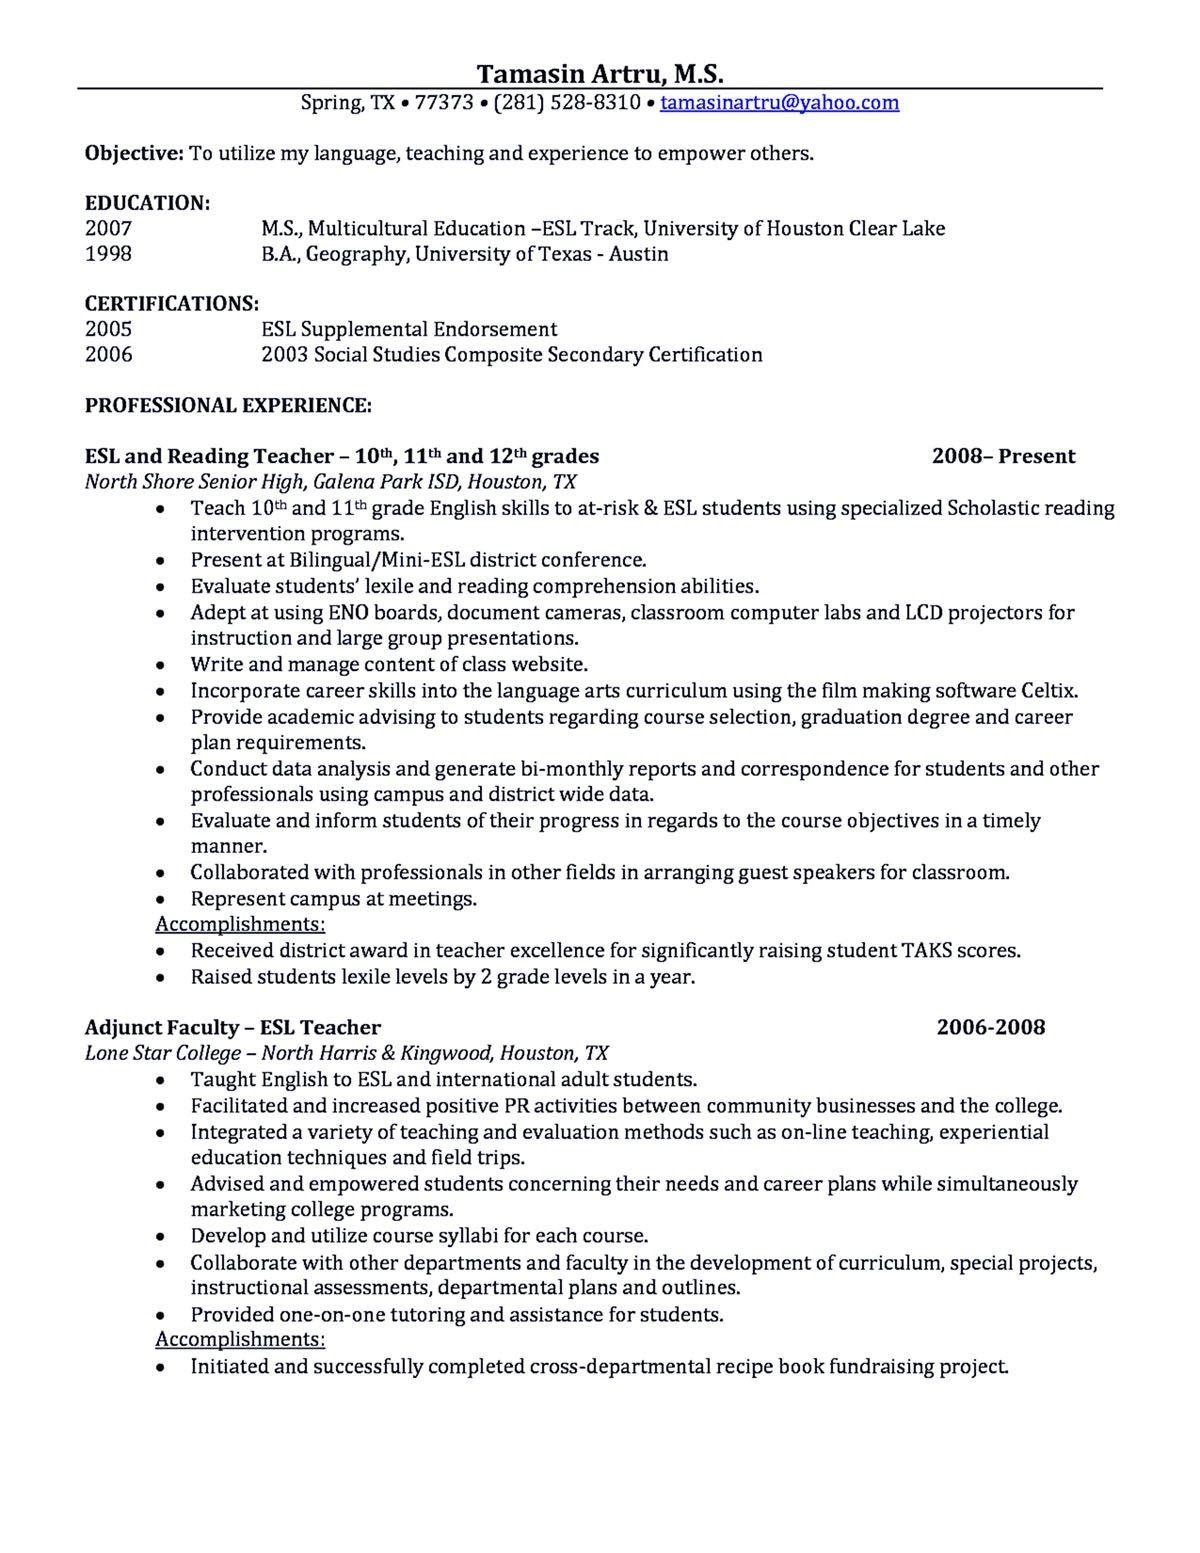 cv template academic latex academic cvtemplate latex template